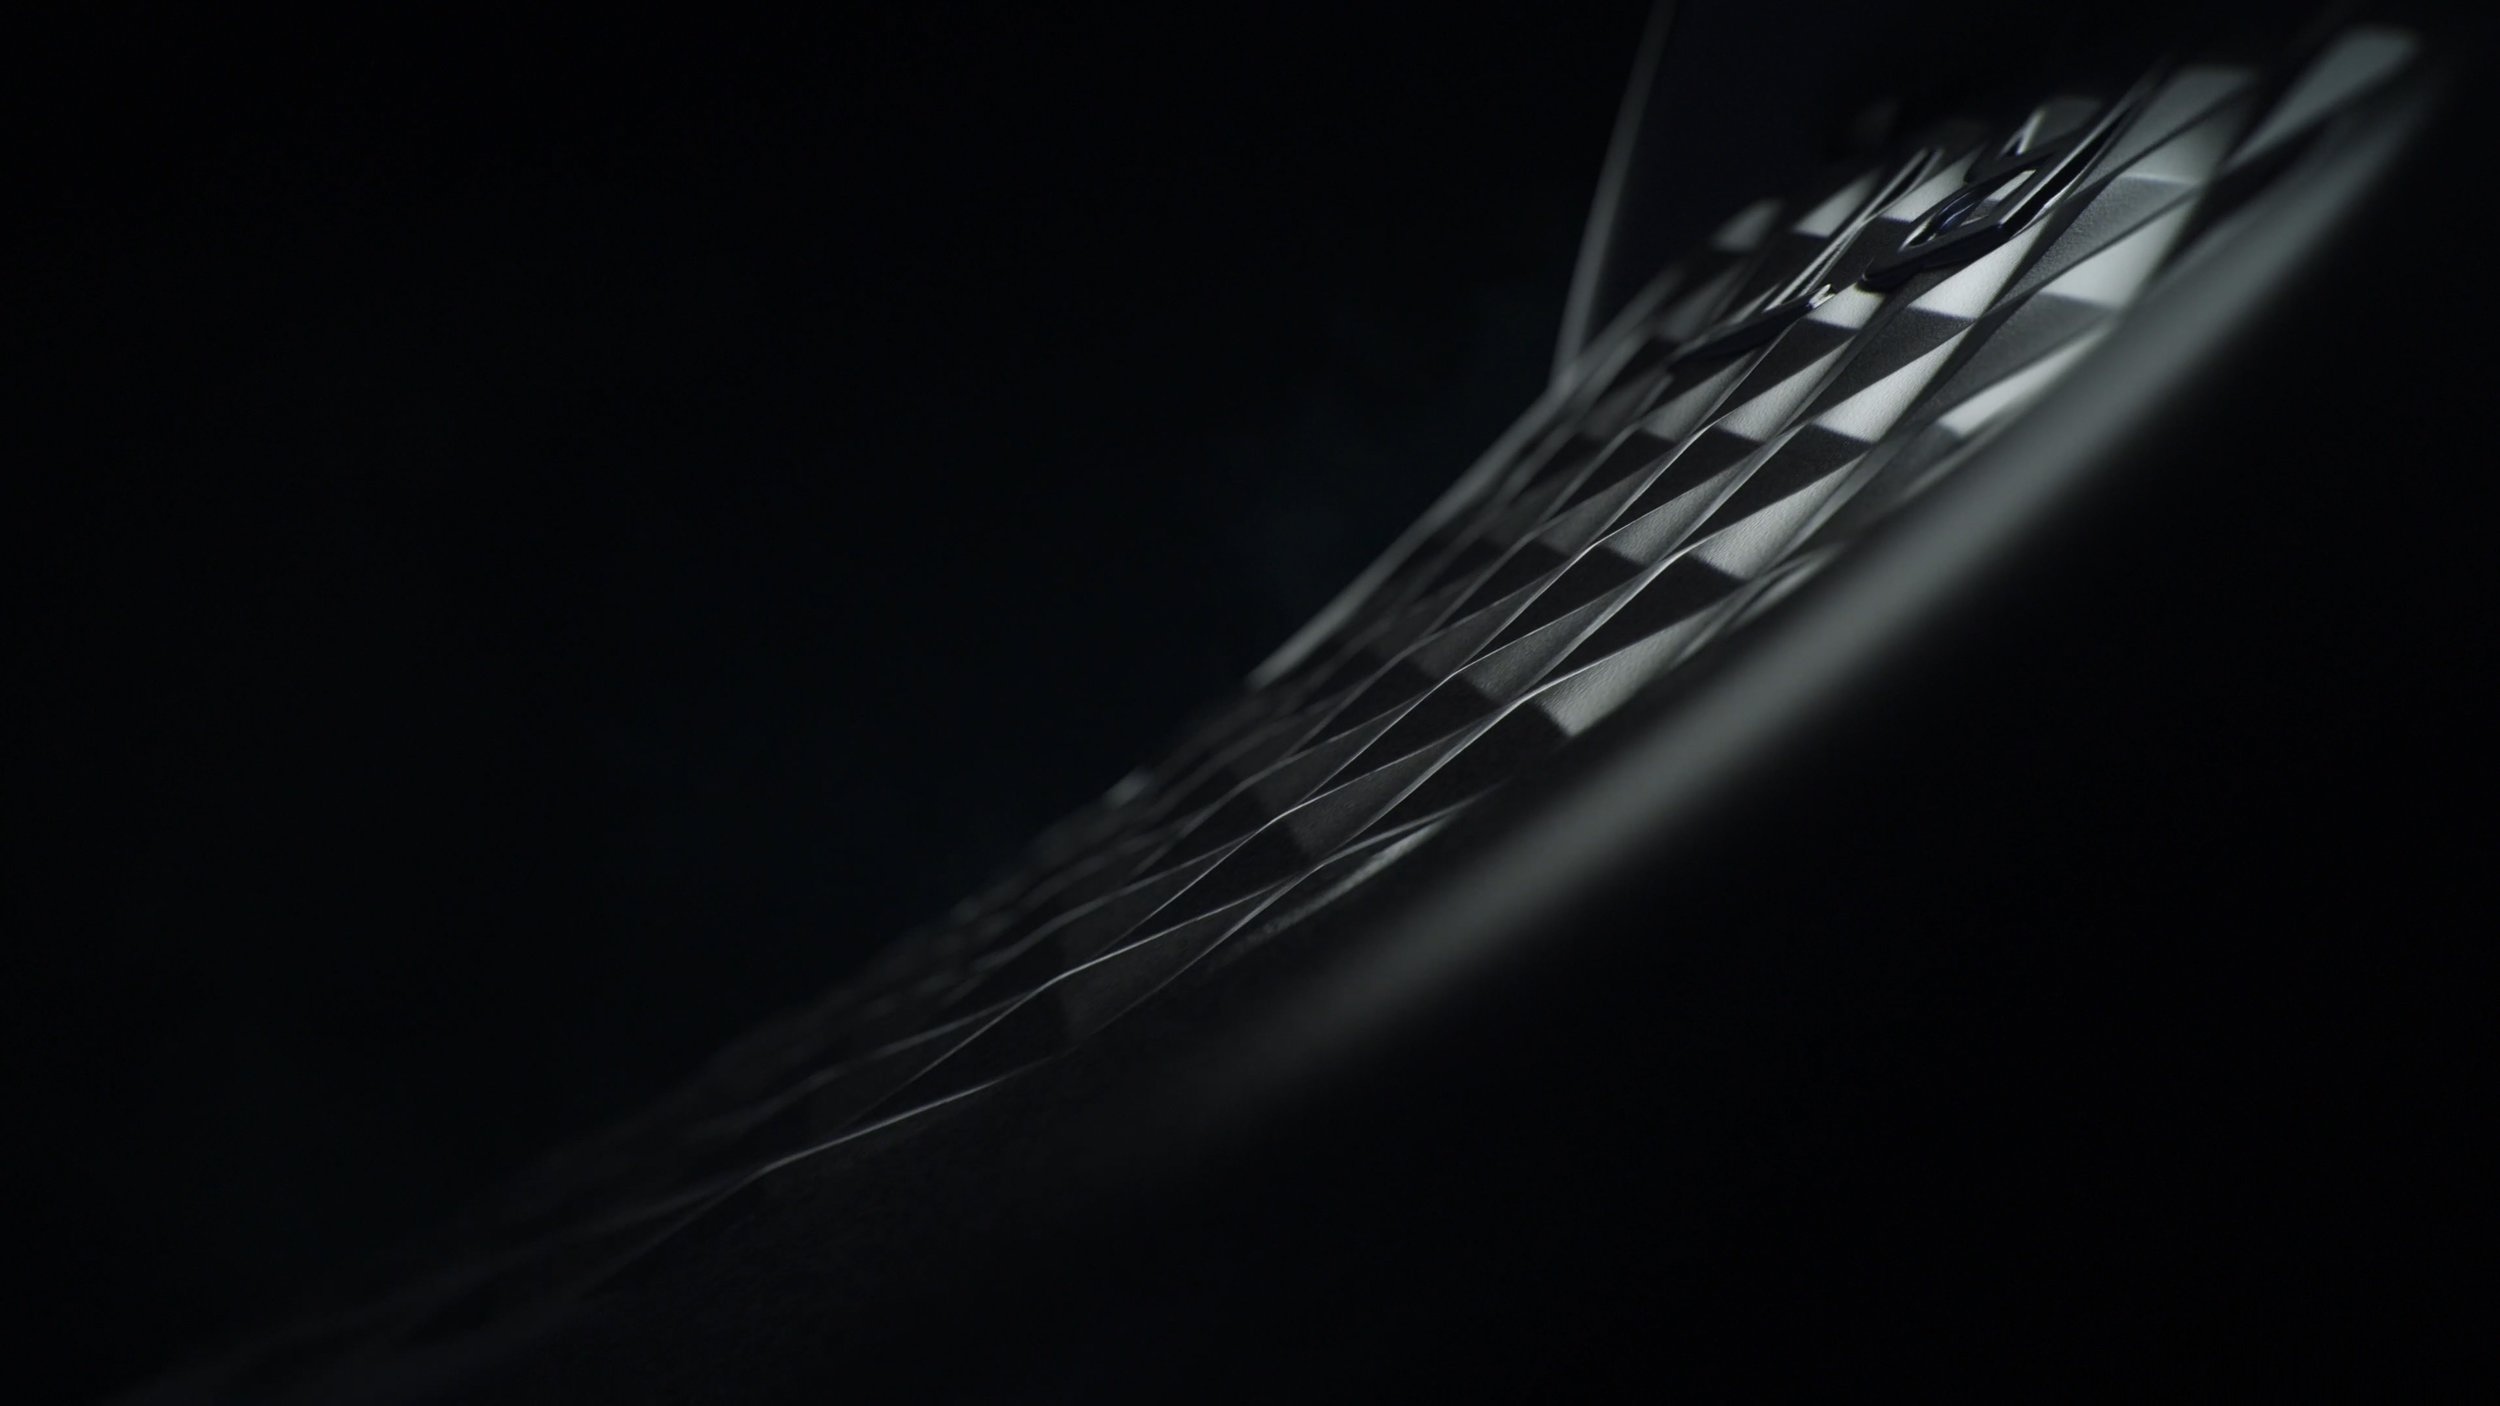 E319_Delphi_Trailer_Breifing_NoRating_4KUHD_2160p_2997_ProRes4444_51_-24lkfs_4k (108170).jpg